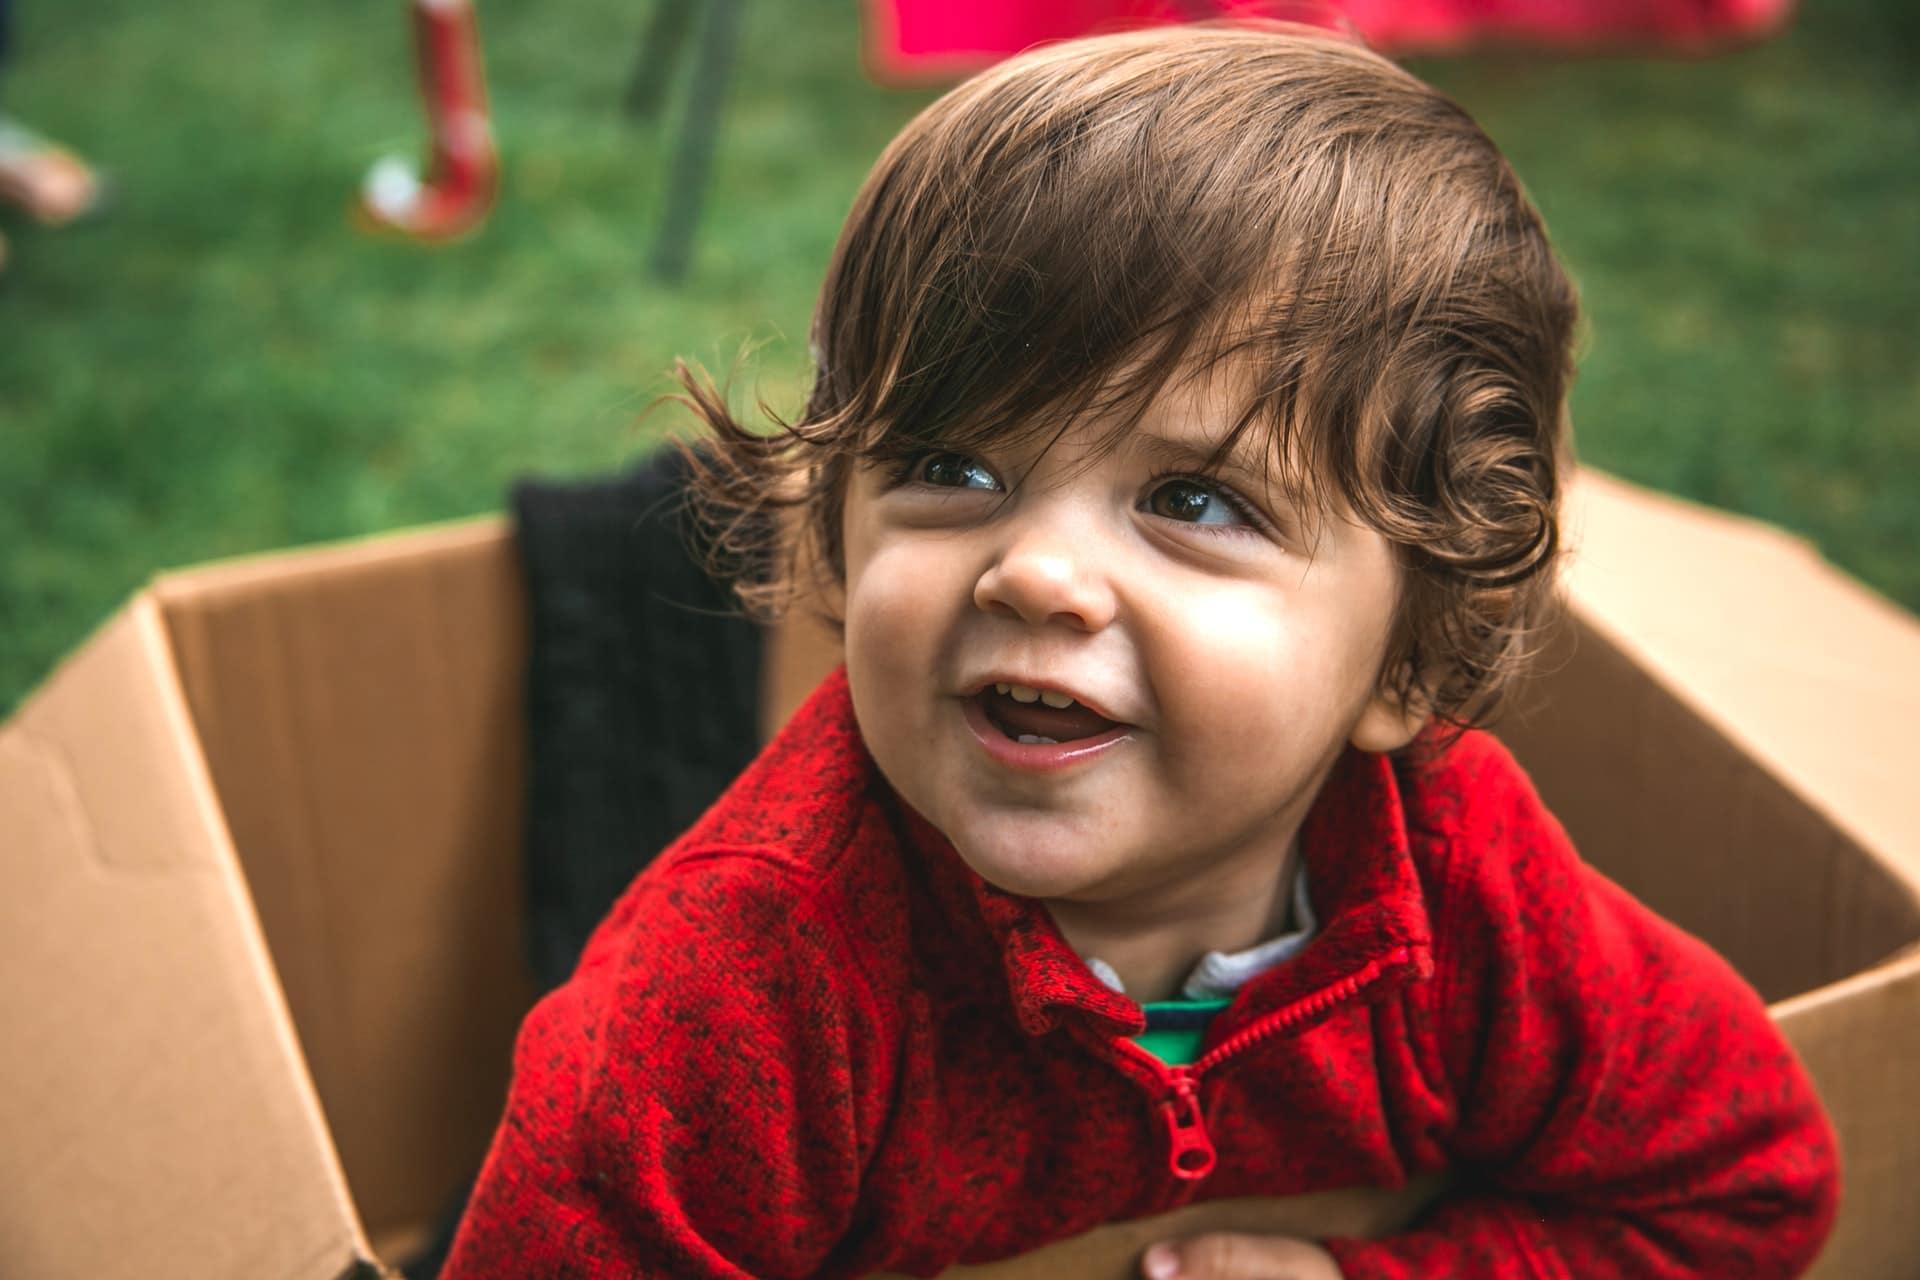 michael cox k5 GVp0ZIwo unsplash - When do Babies Hair Texture Change?